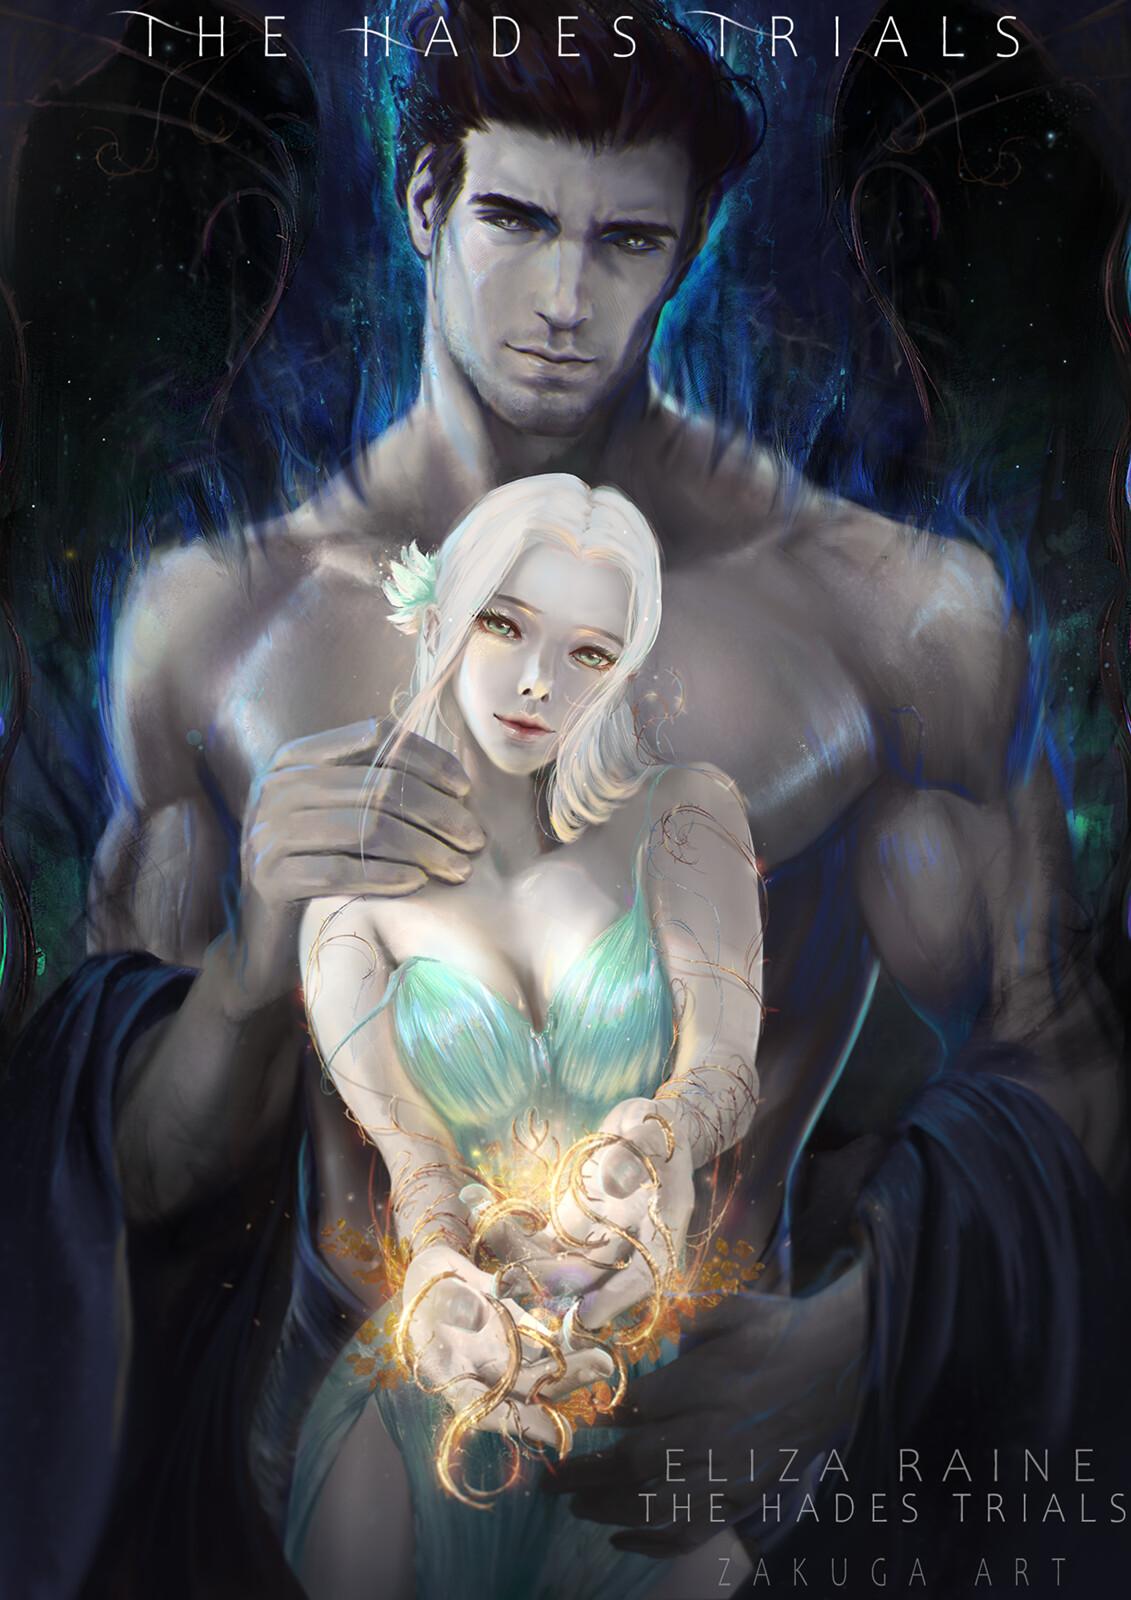 The Hades Trials